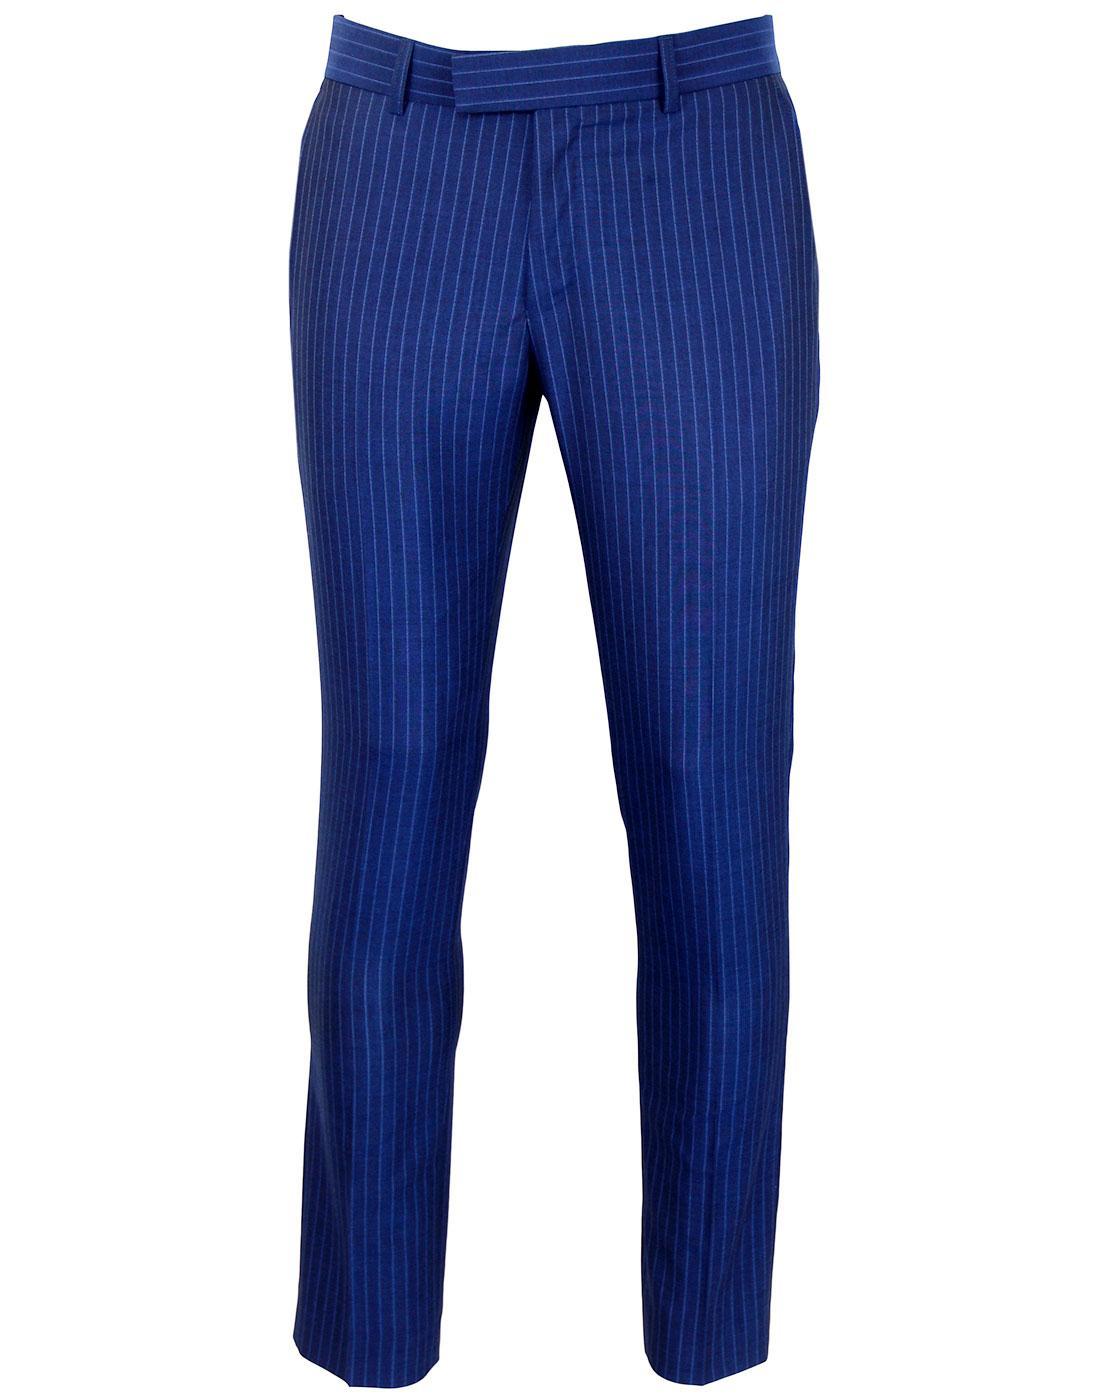 MADCAP ENGLAND Mod Royal Pinstripe Suit Trousers